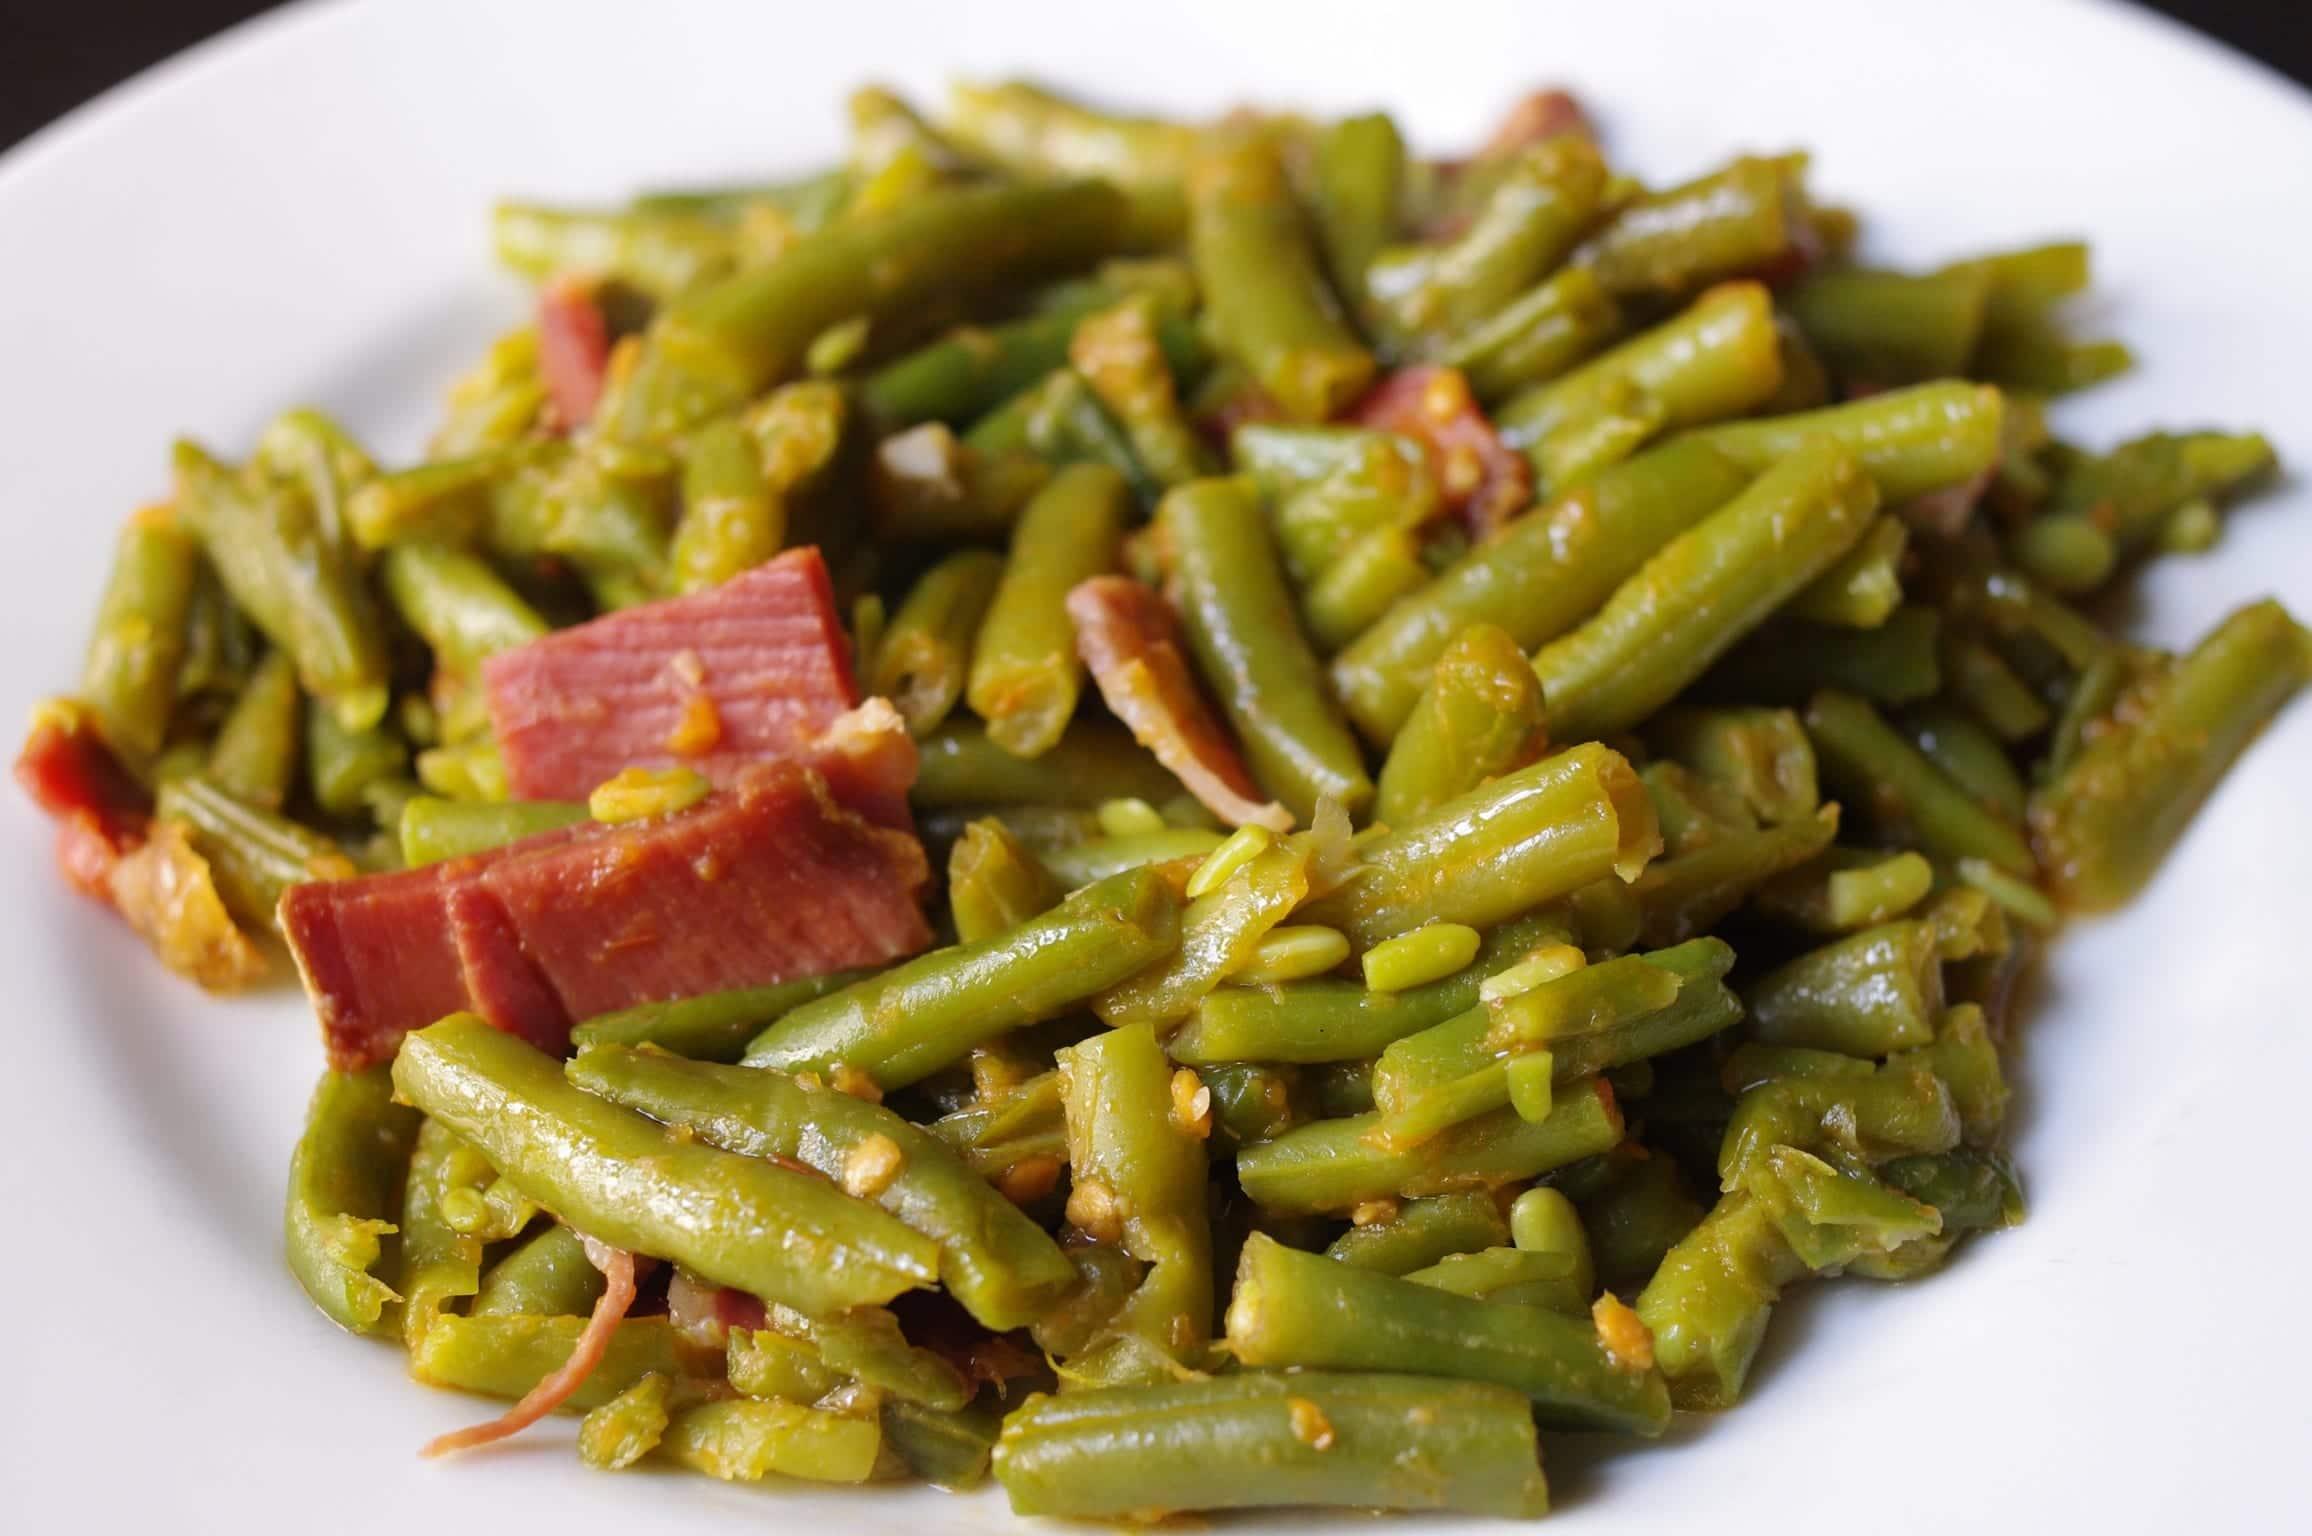 Jud as verdes rehogadas con jam n recet n for Cocinar judias verdes de bote